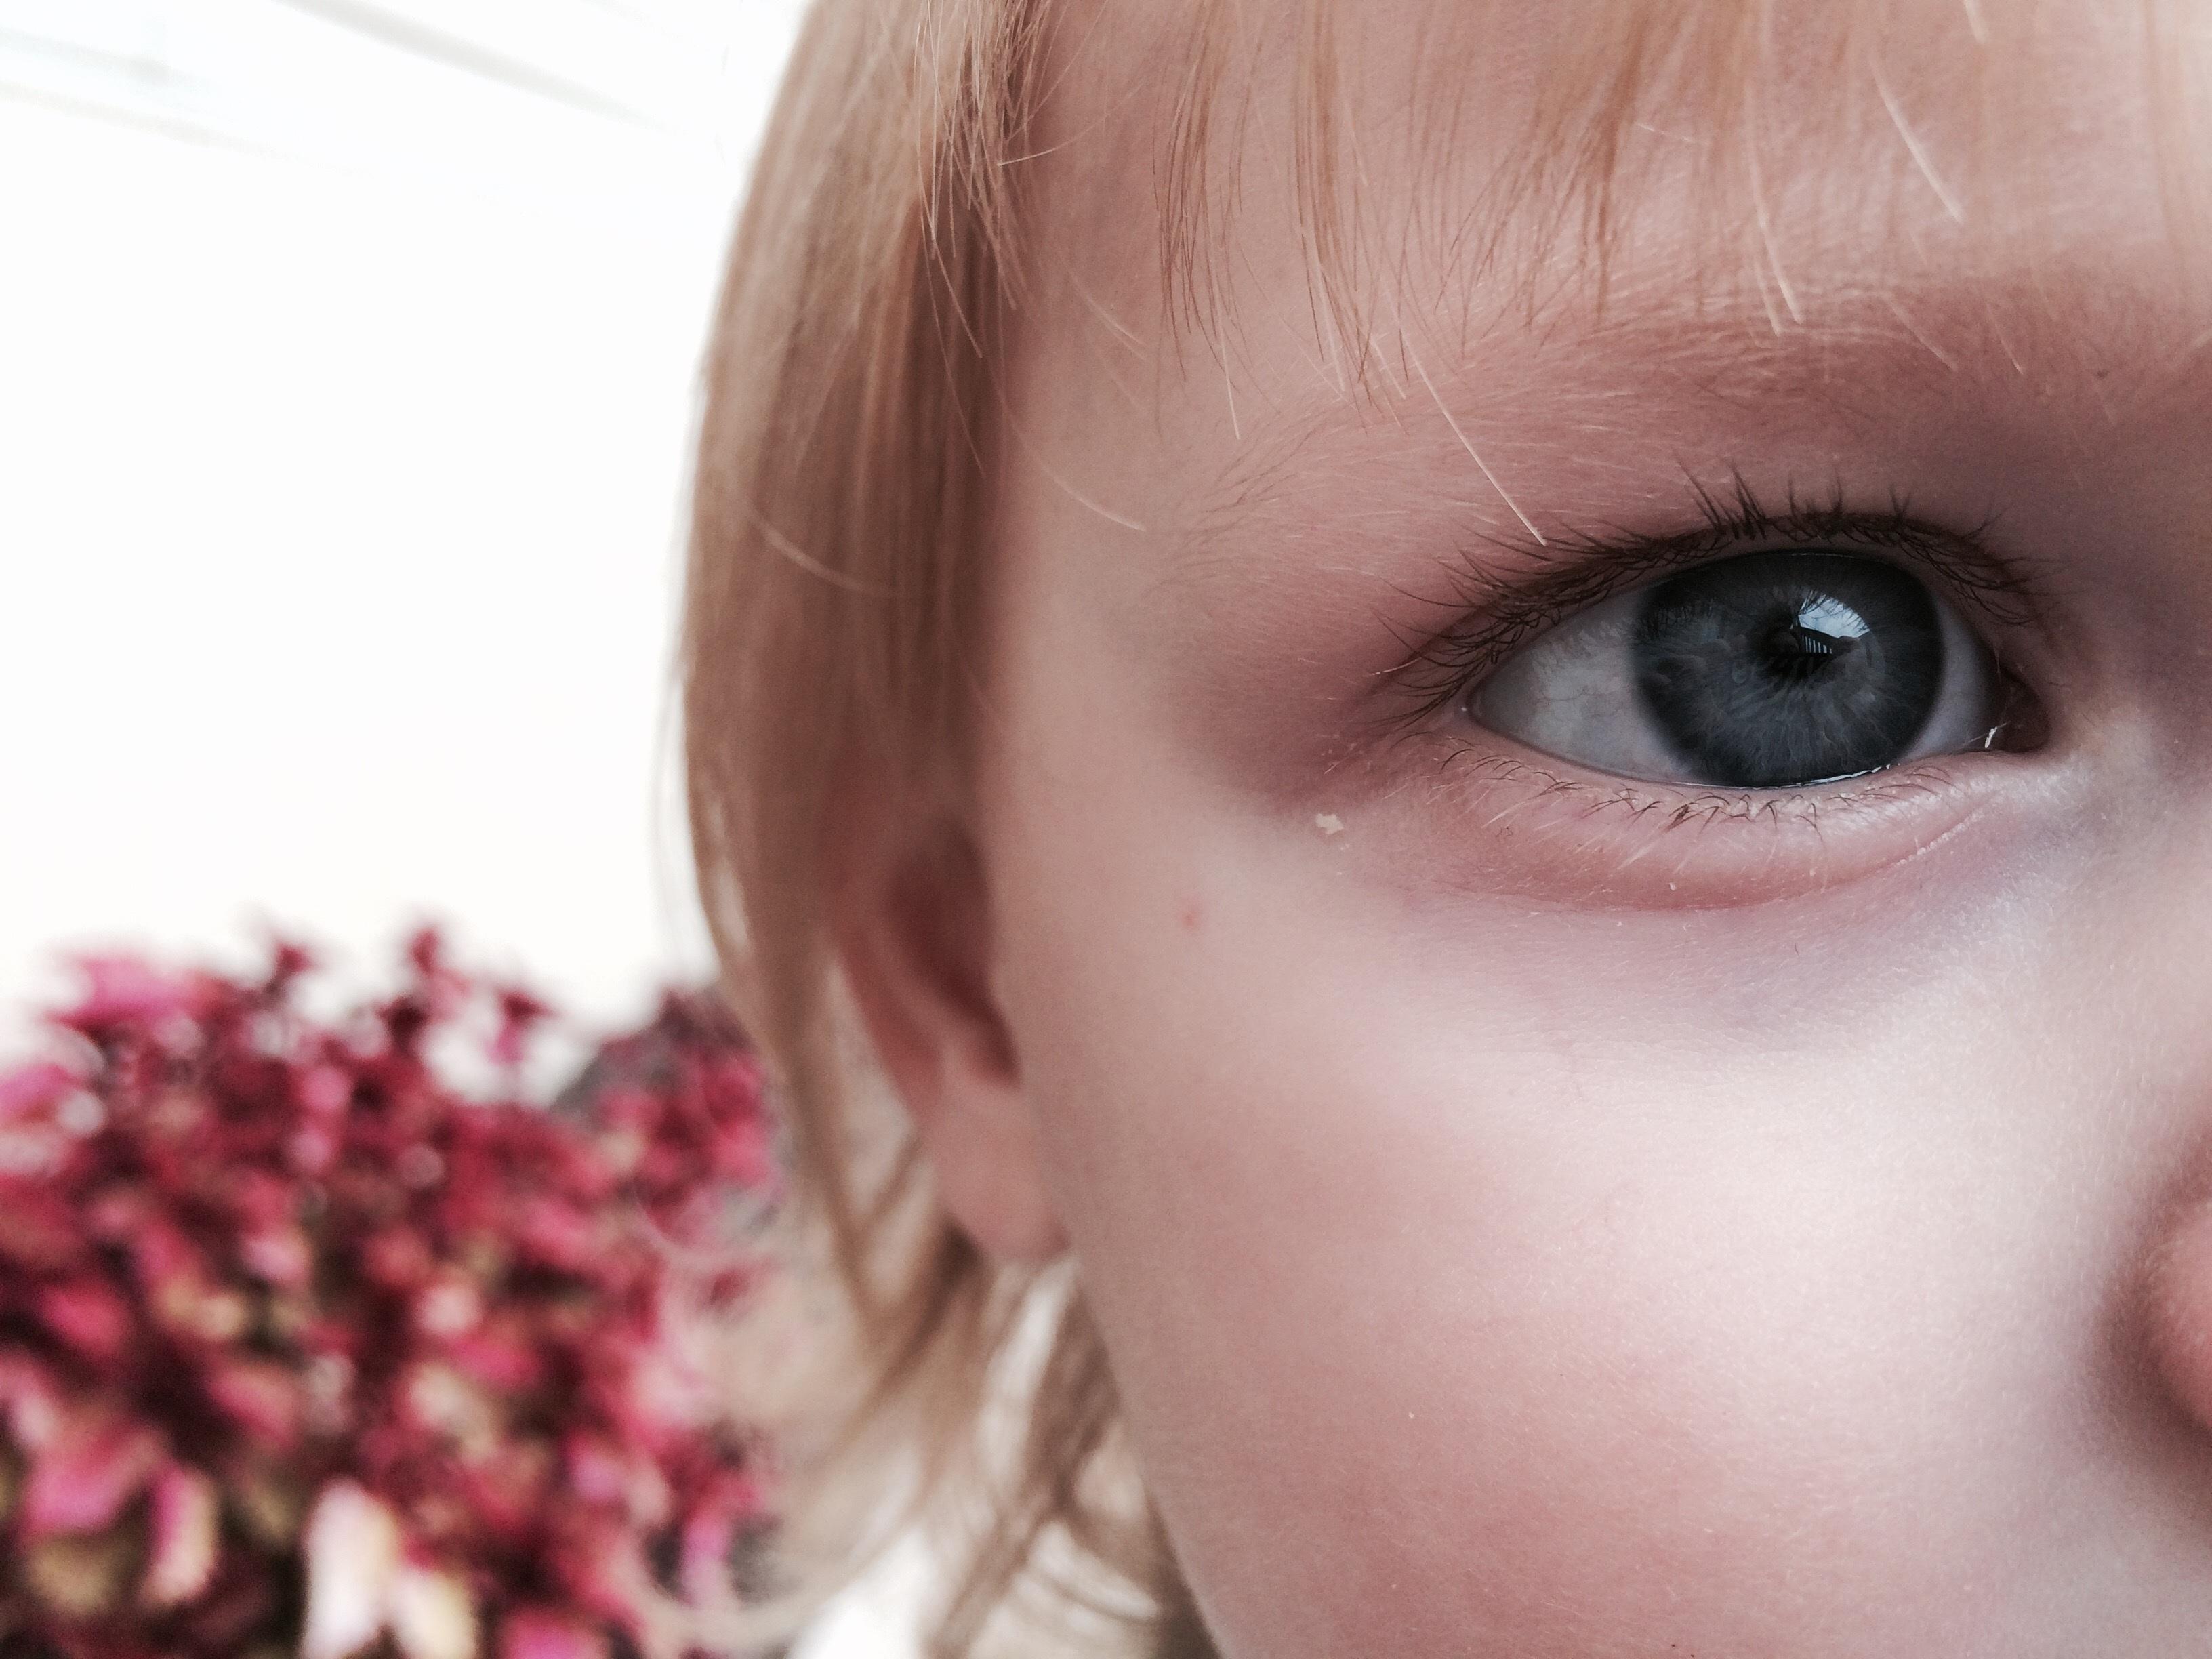 baby pink eye - HD1200×900